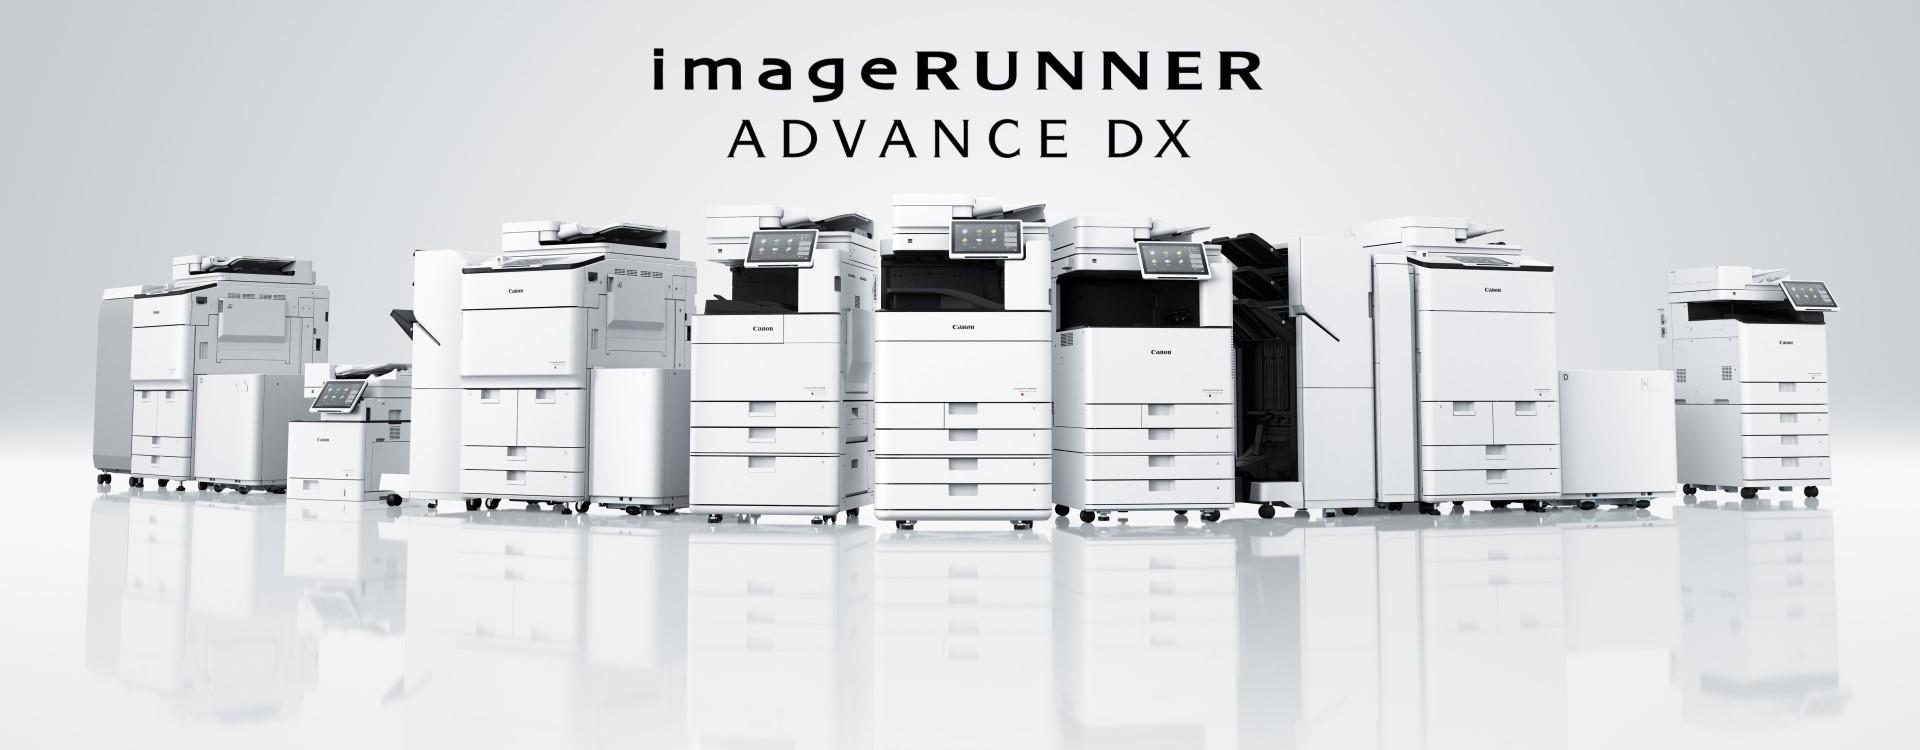 imageRUNNER ADVANCE DX_Banner 4